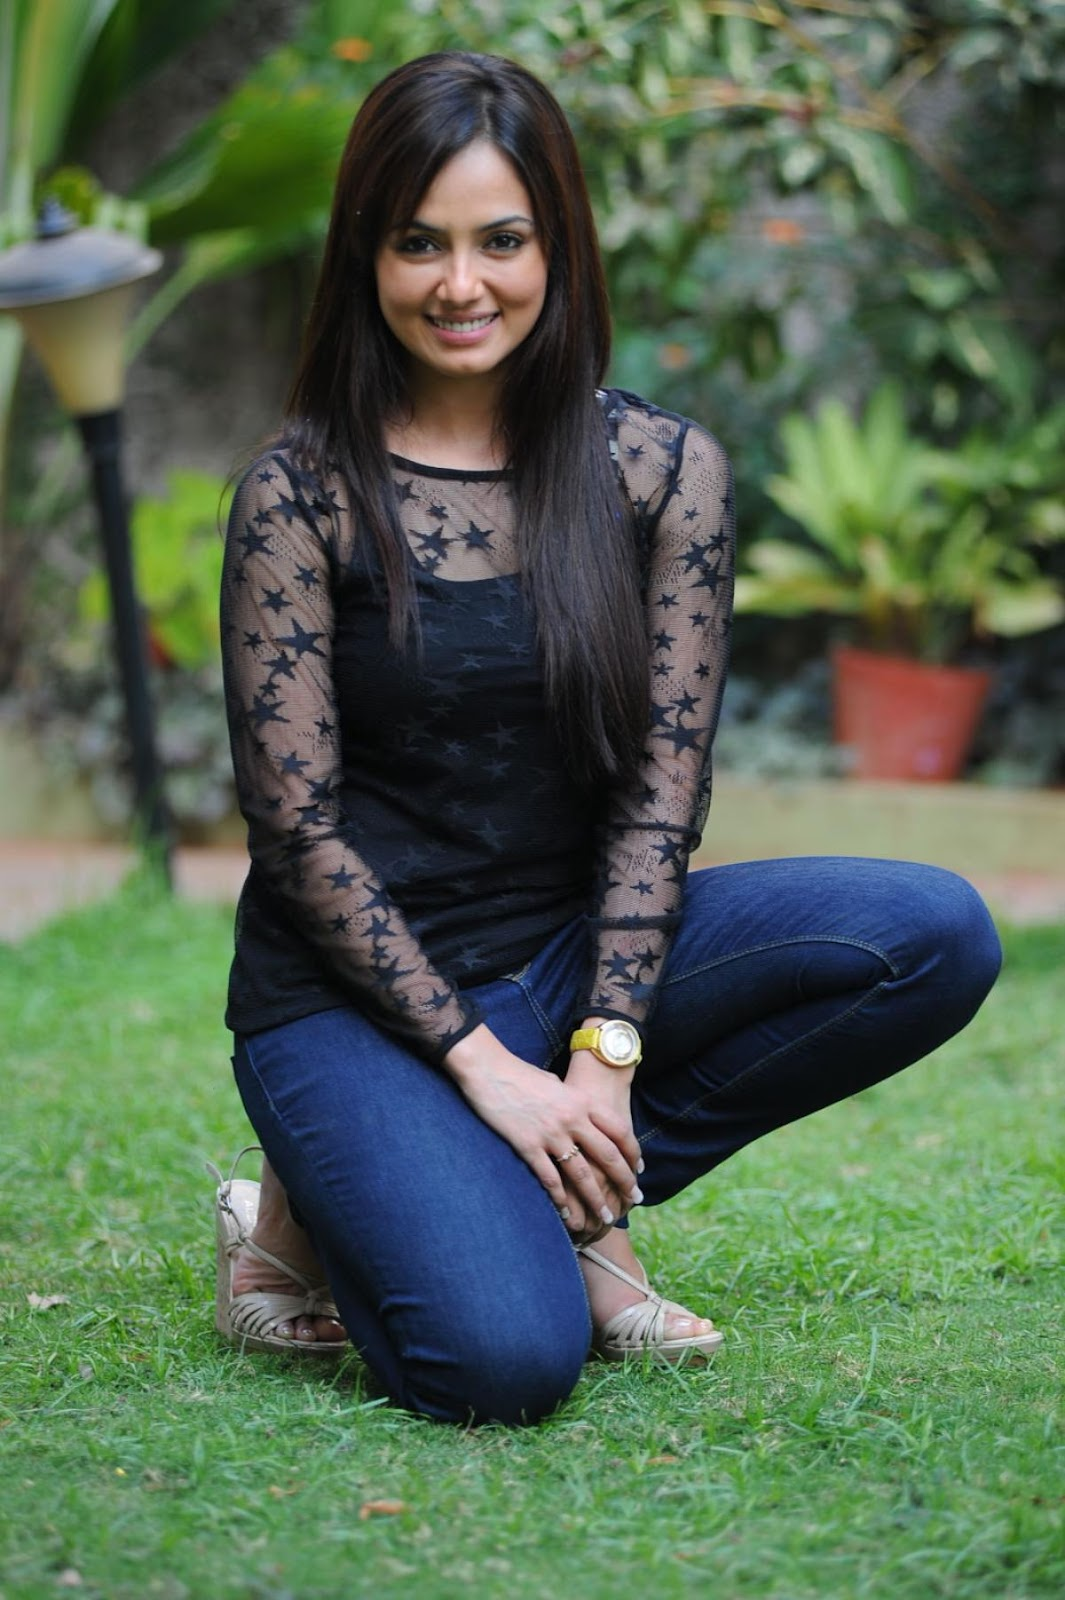 http://4.bp.blogspot.com/-cV7KJ4yiOp4/T7wDaNCsKvI/AAAAAAAAFd0/lRtdTUHJJOo/s1600/sana-khan-hot-black-dress+(5).jpg